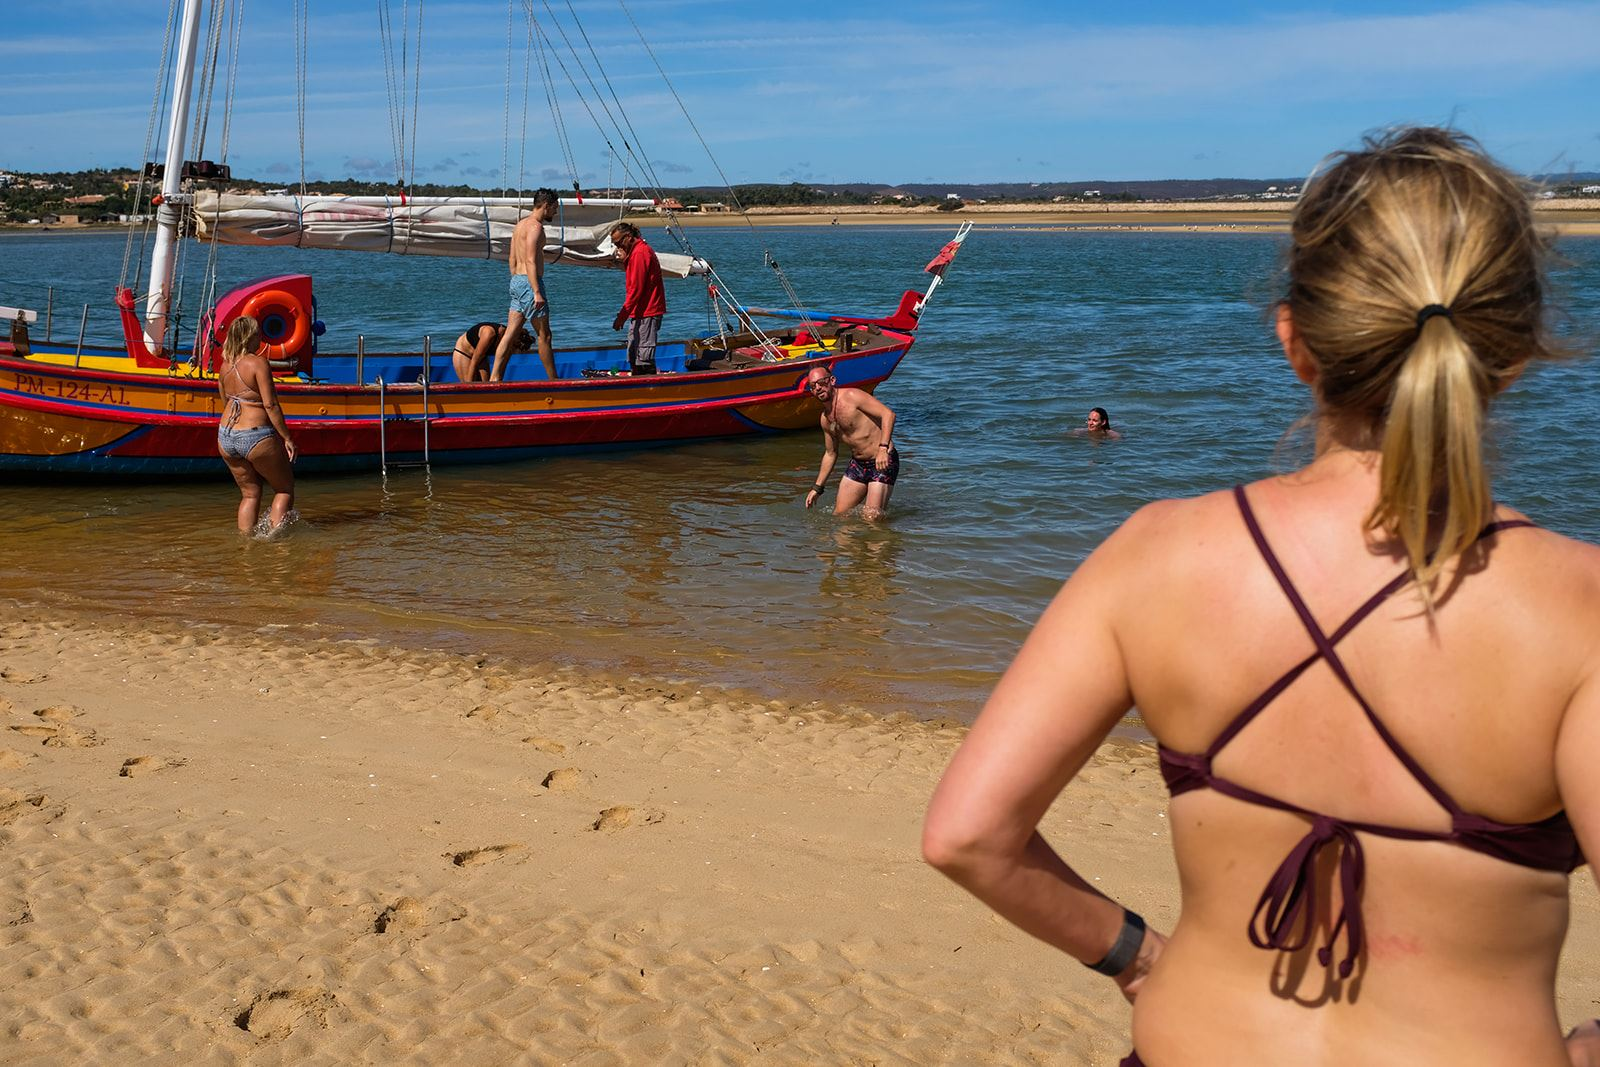 Camper retreat Digital Nomad Campervan Algarve Portugal Caravan Boat